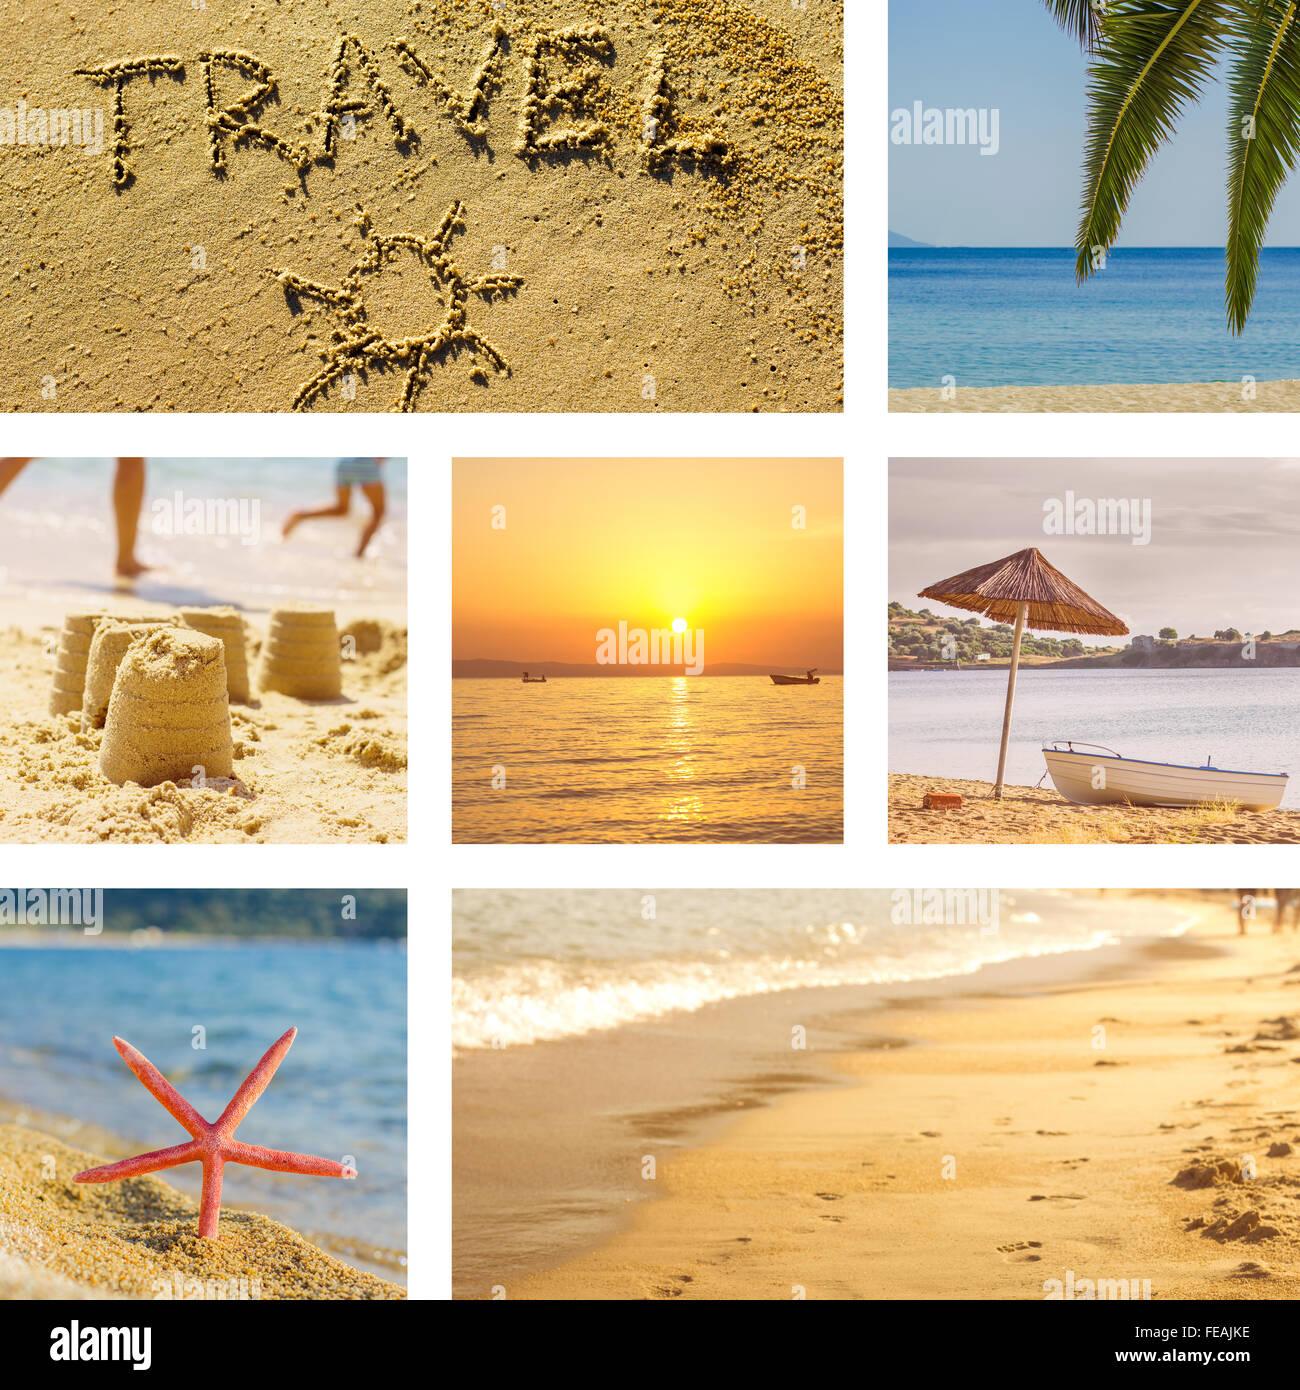 Beach Scene Collage Stock Photos & Beach Scene Collage Stock Images ...